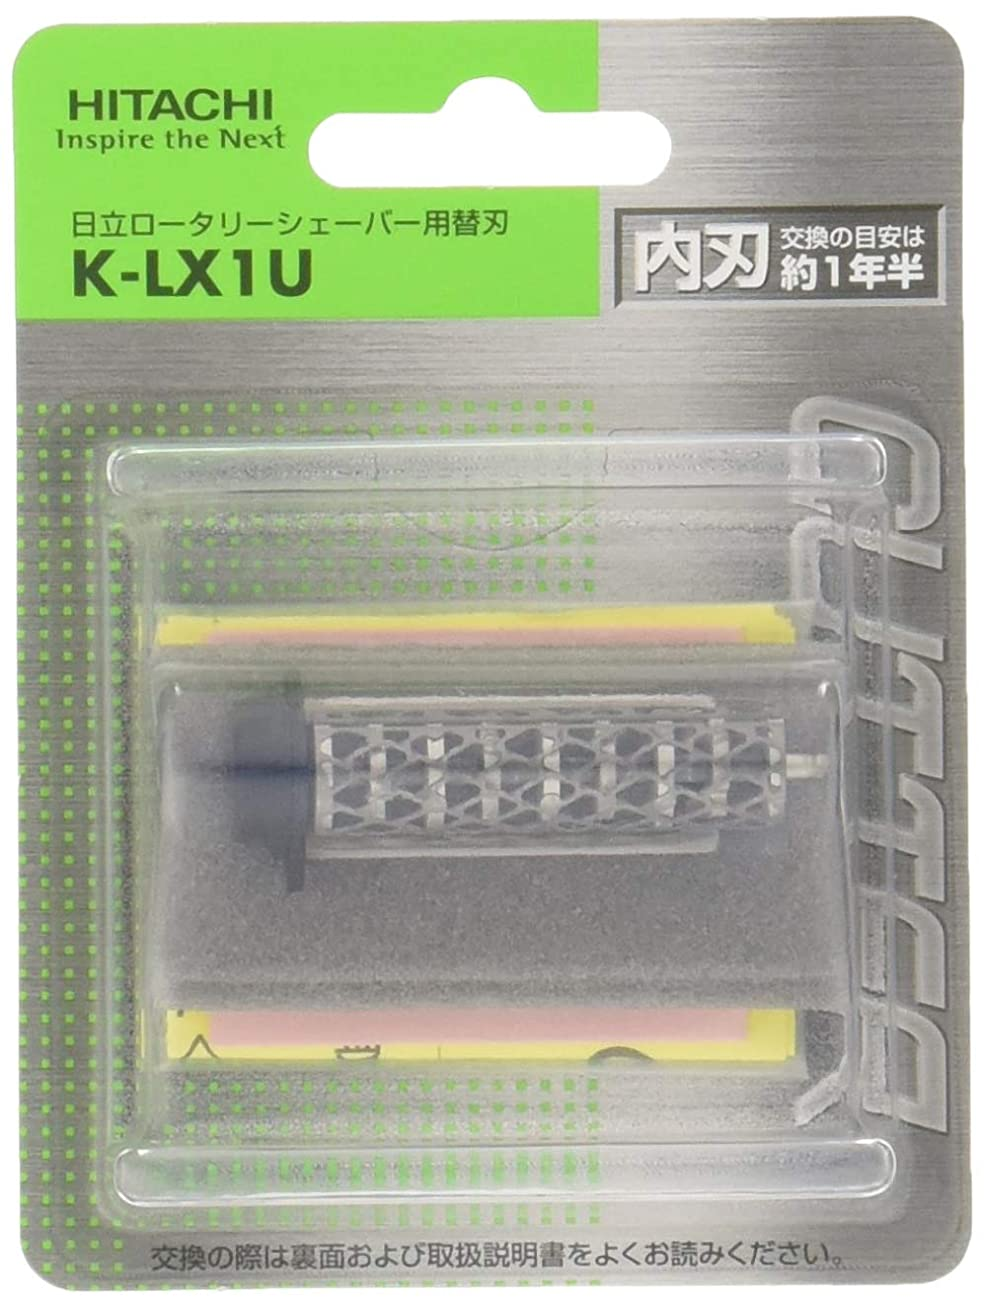 姪行為怪物日立 シェーバー用替刃(内刃) K-LX1U